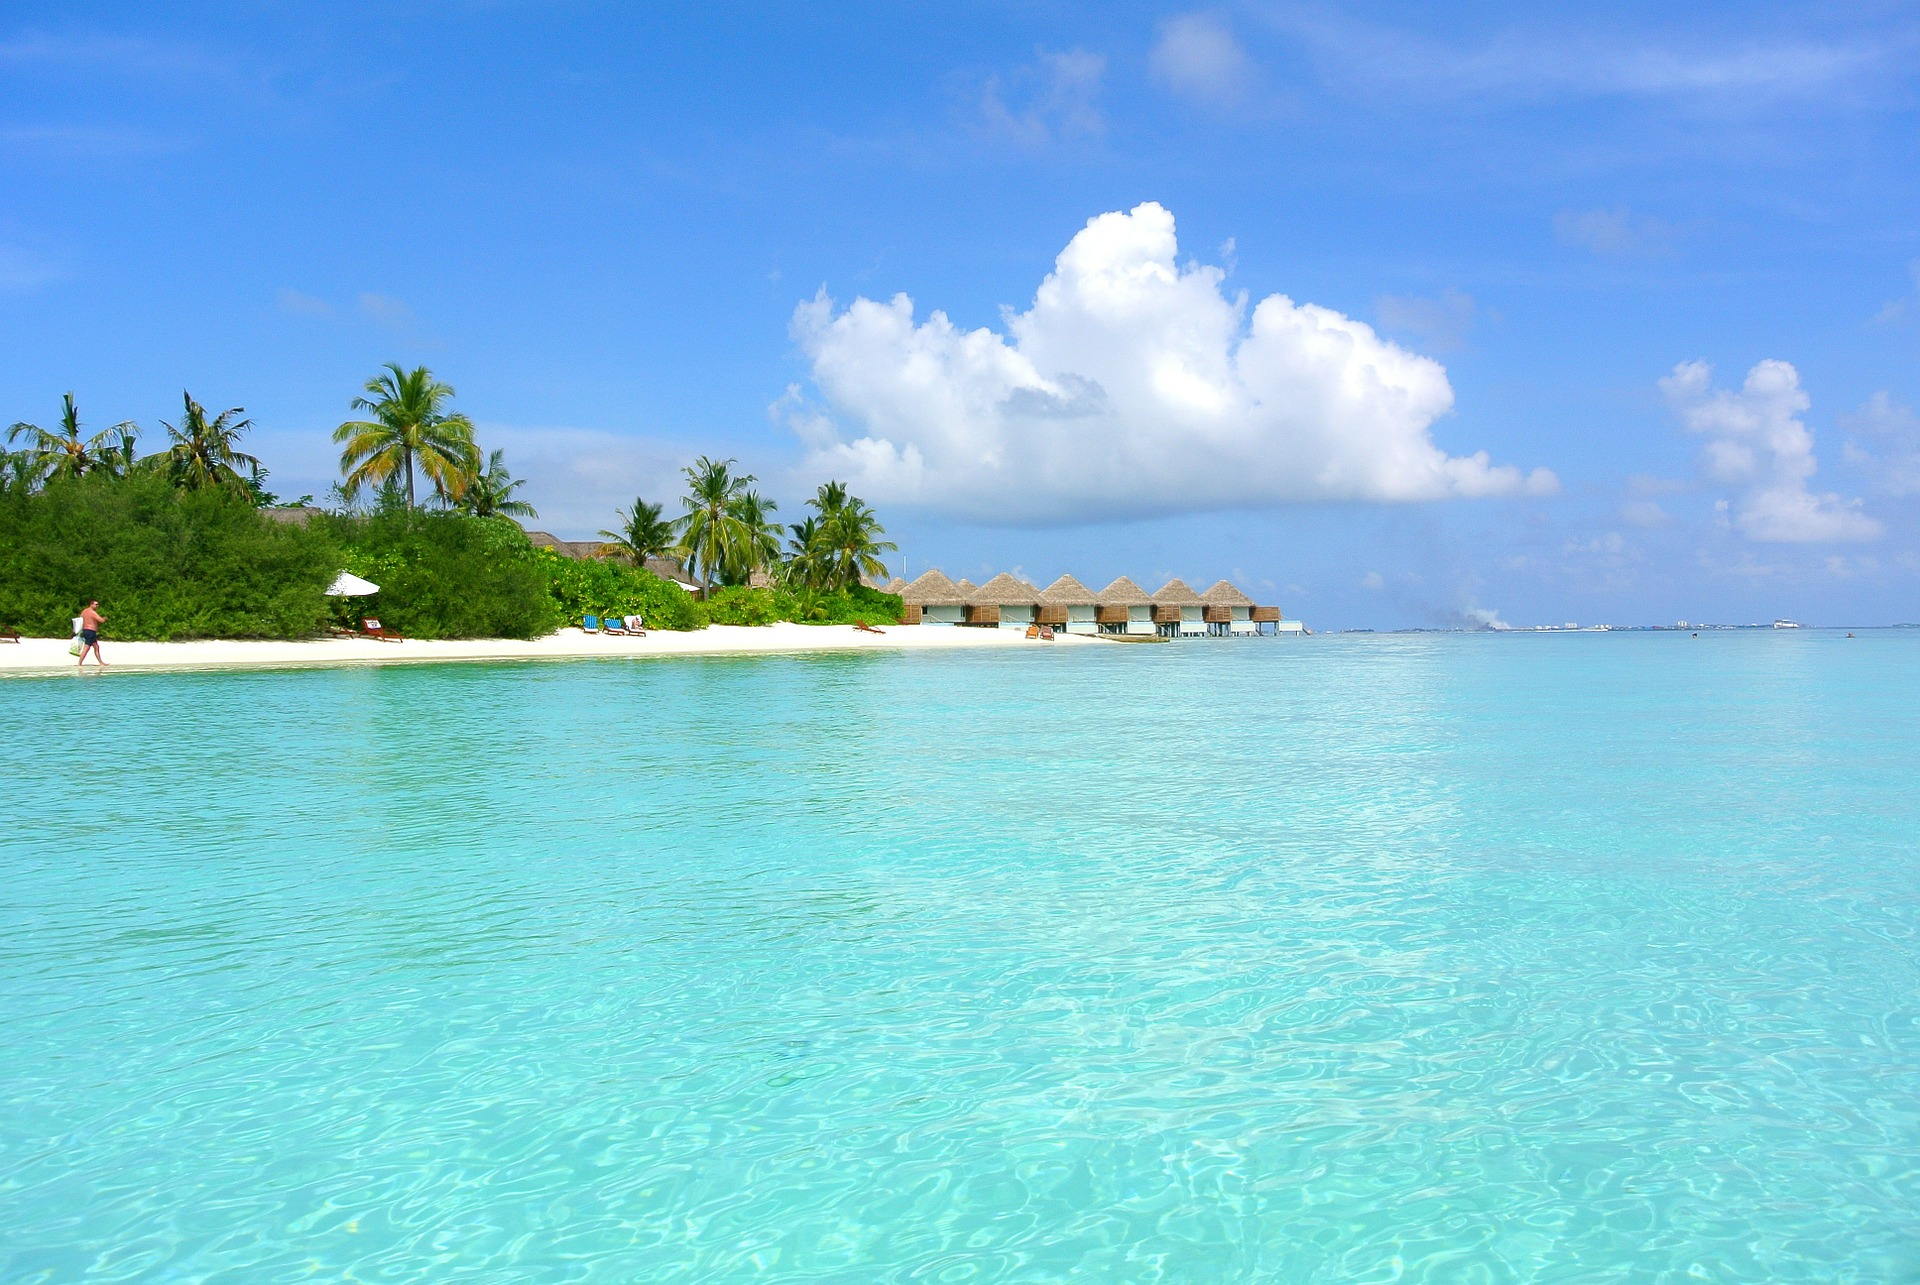 Maldives perfect honeymoon destination